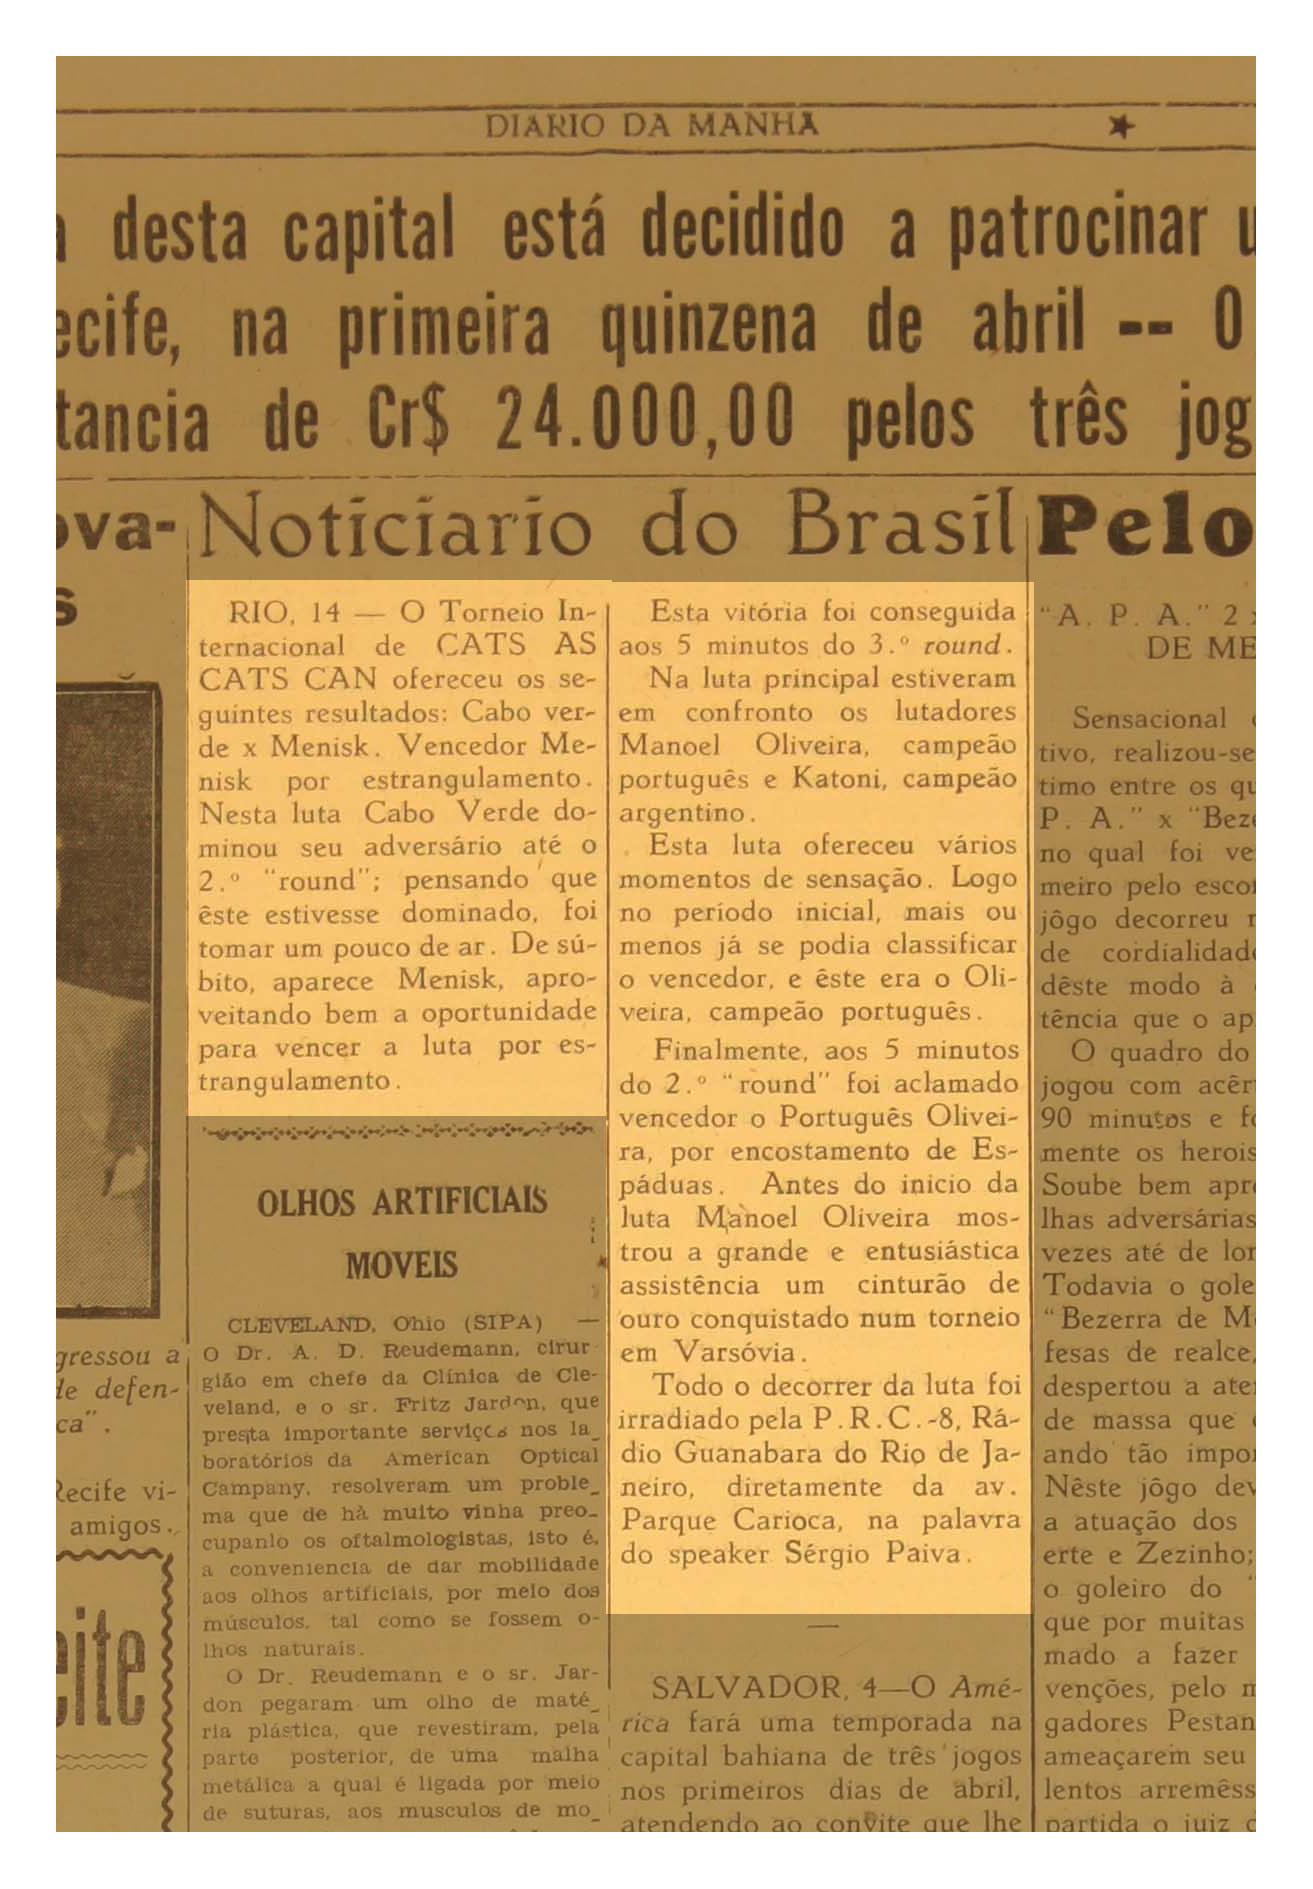 Diario-da-Manha-1948-Ed.-0316-Cabo-Verde-O-copy.JPG